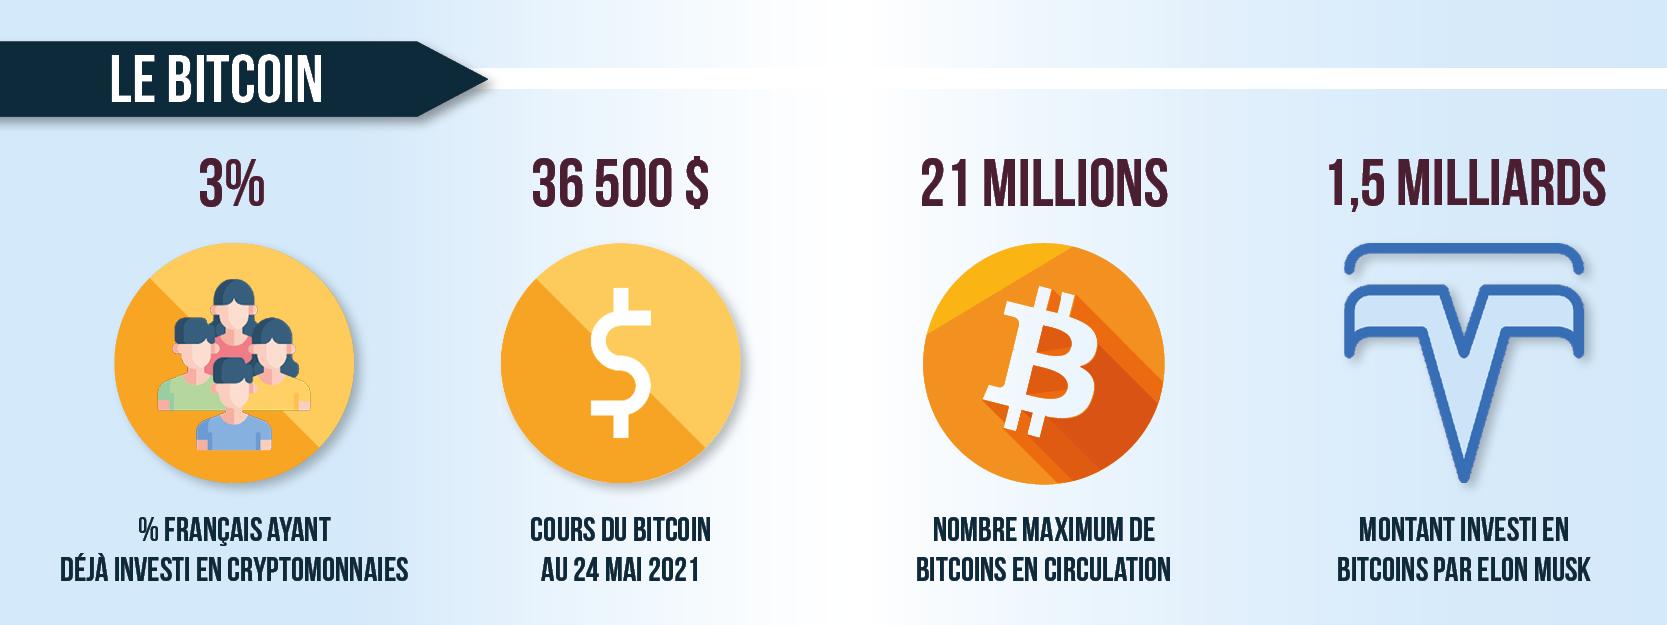 https://blog-prodemial.fr/wp-content/uploads/2021/05/bitcoin-blog-prodemial.png